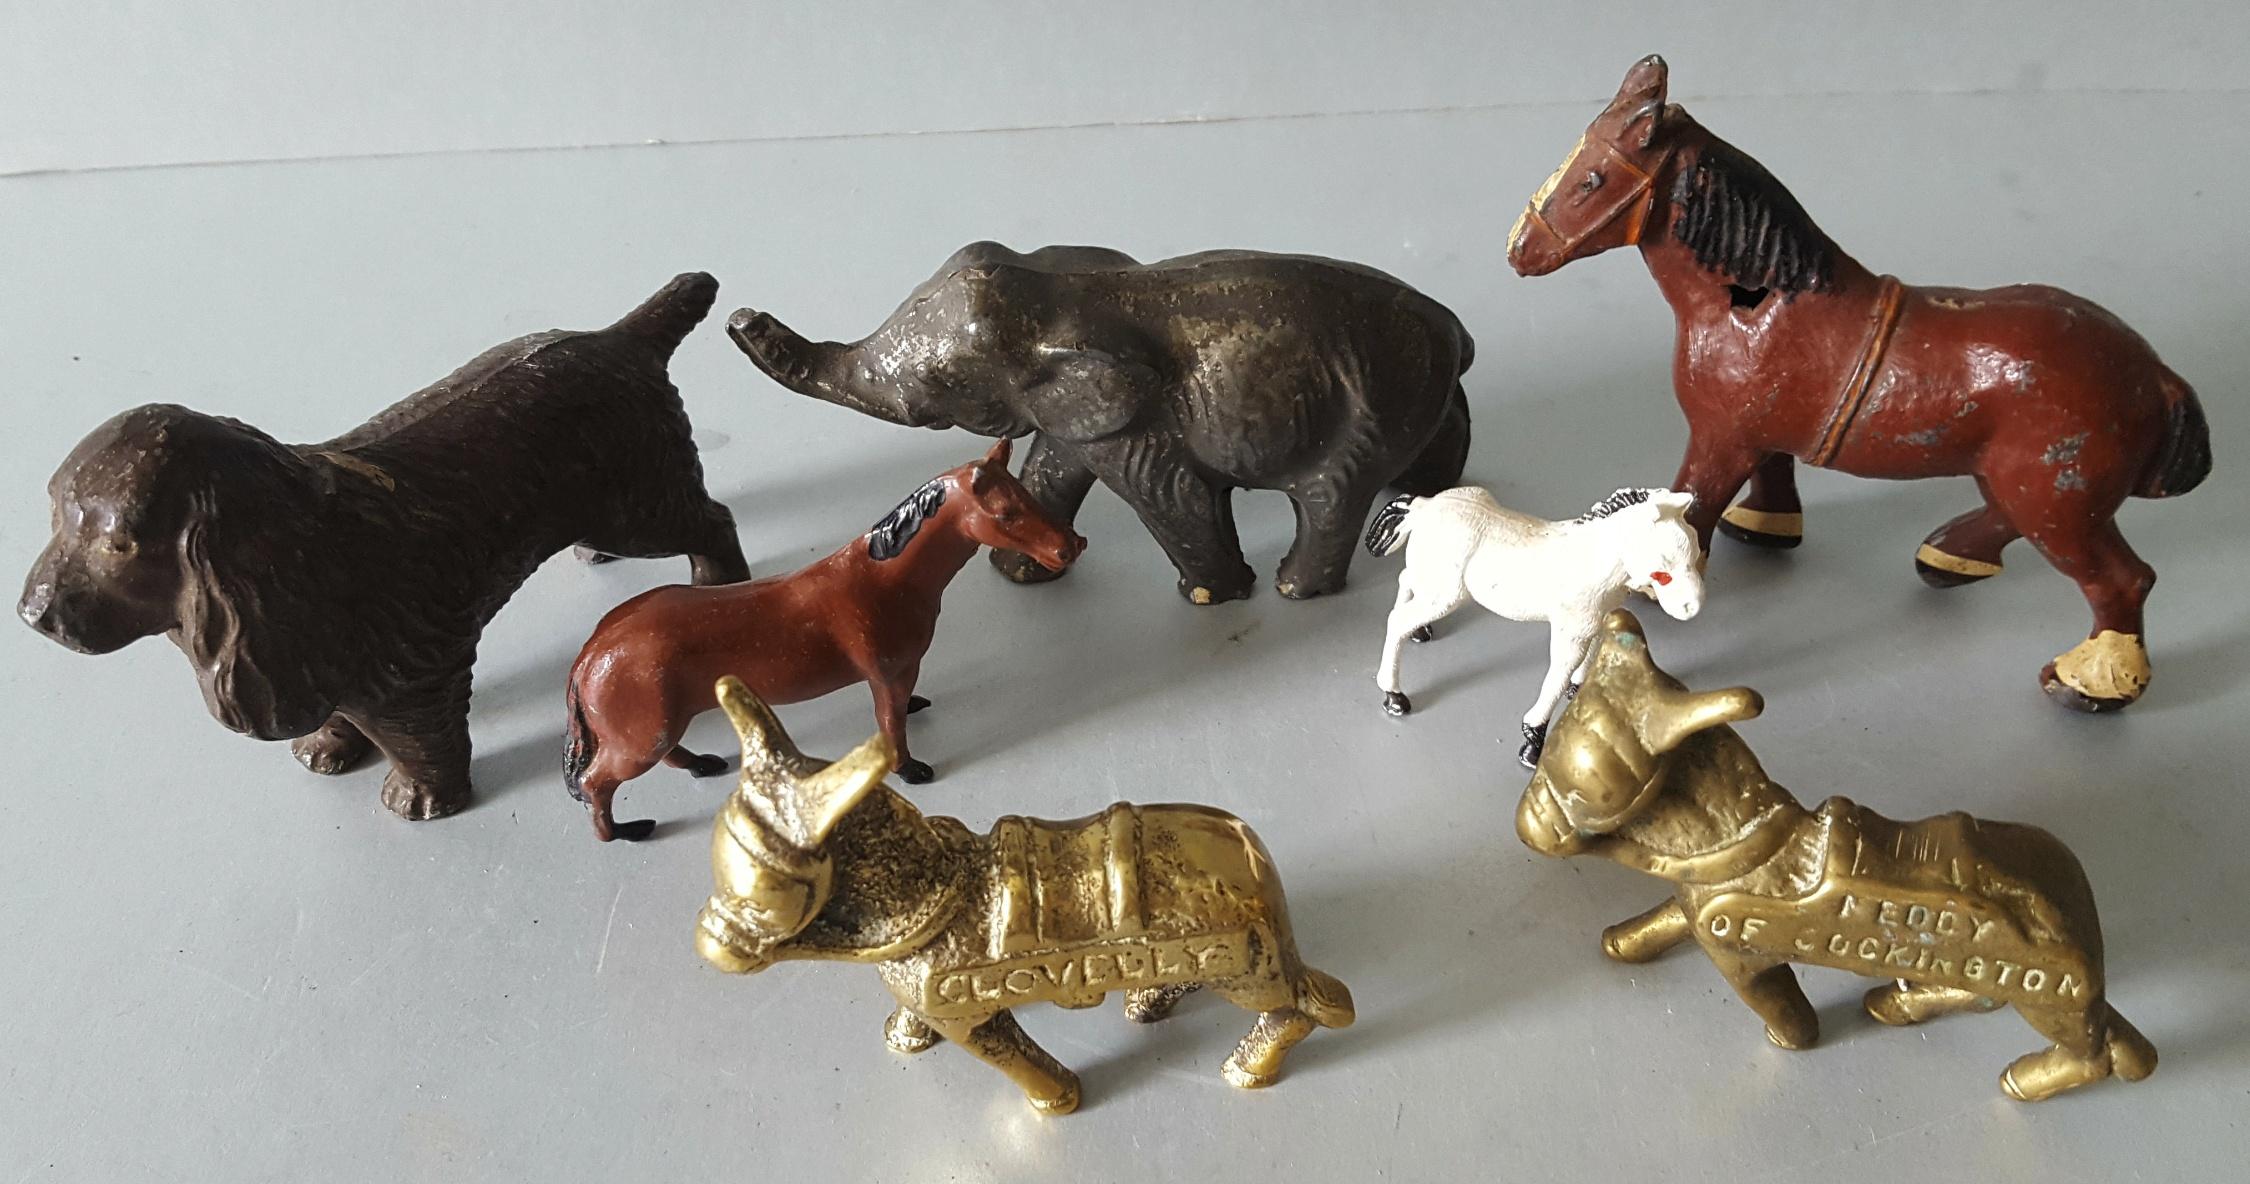 Lot 110 - Vintage Metal Toy Animal Figures Elephant Horses and Donkeys NO RESERVE